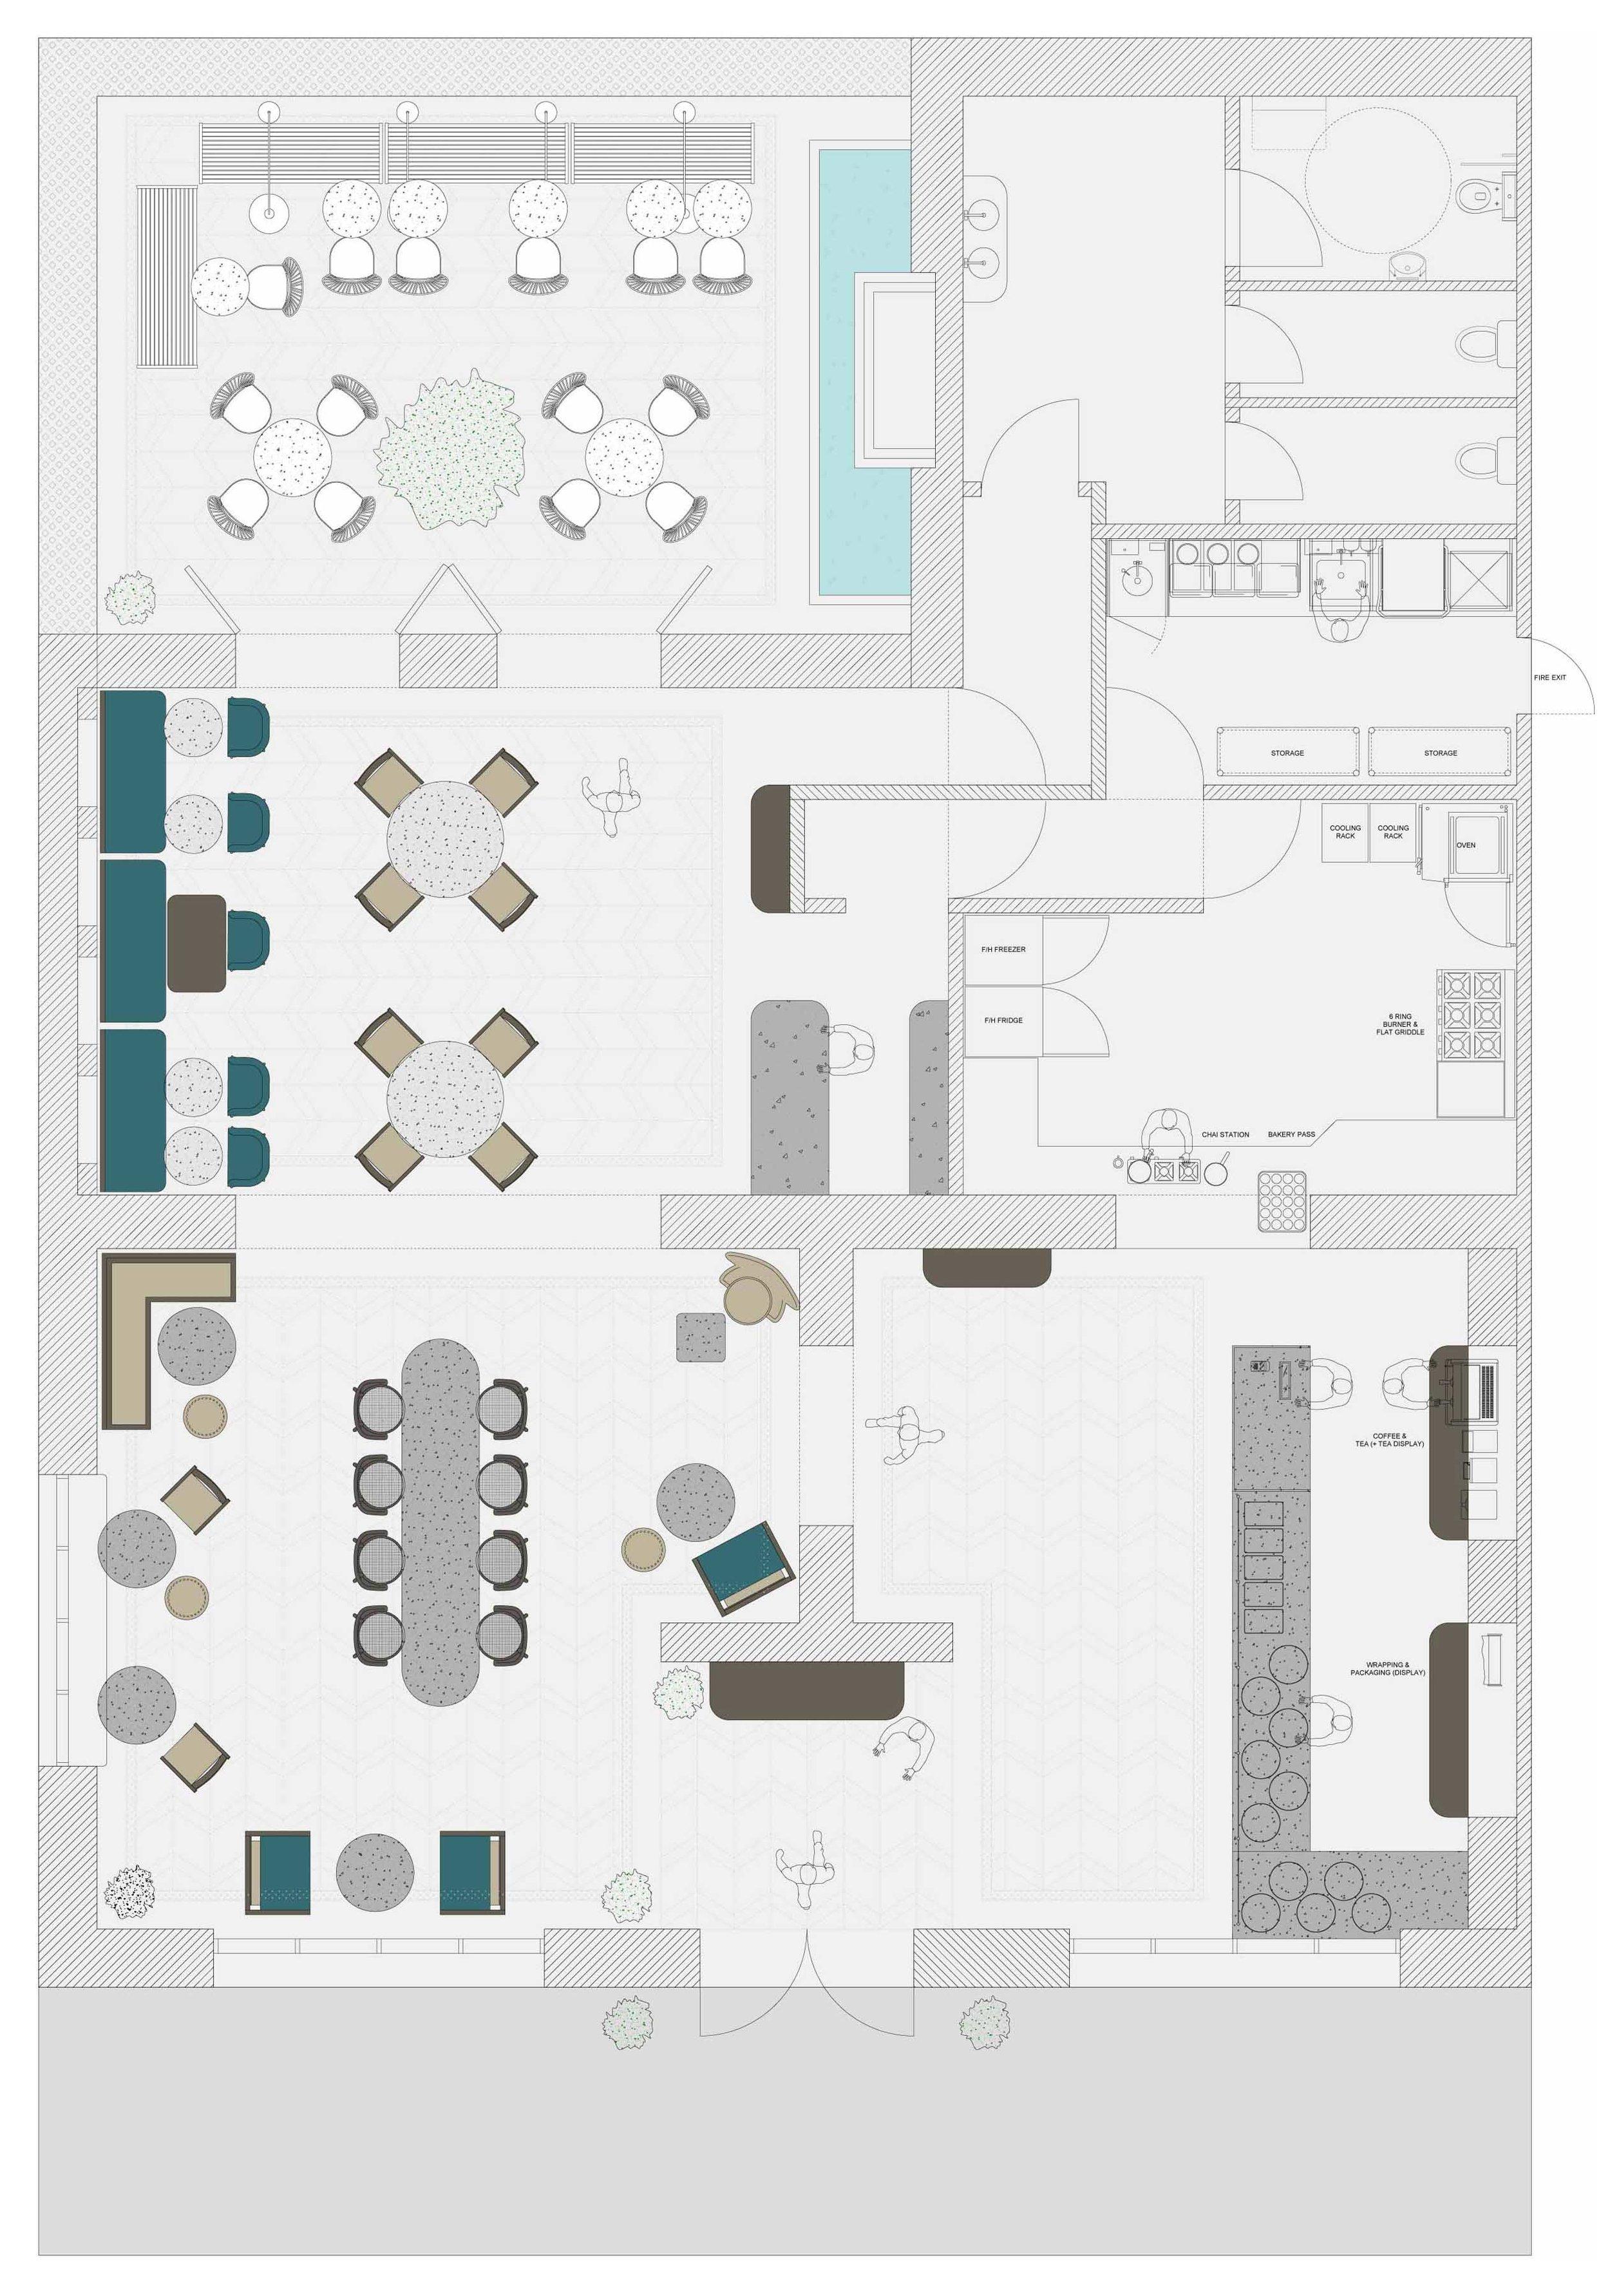 lunarlunar_interior_design_cafe_bakery_restaurant_pistachio_rose_floorplan.jpg